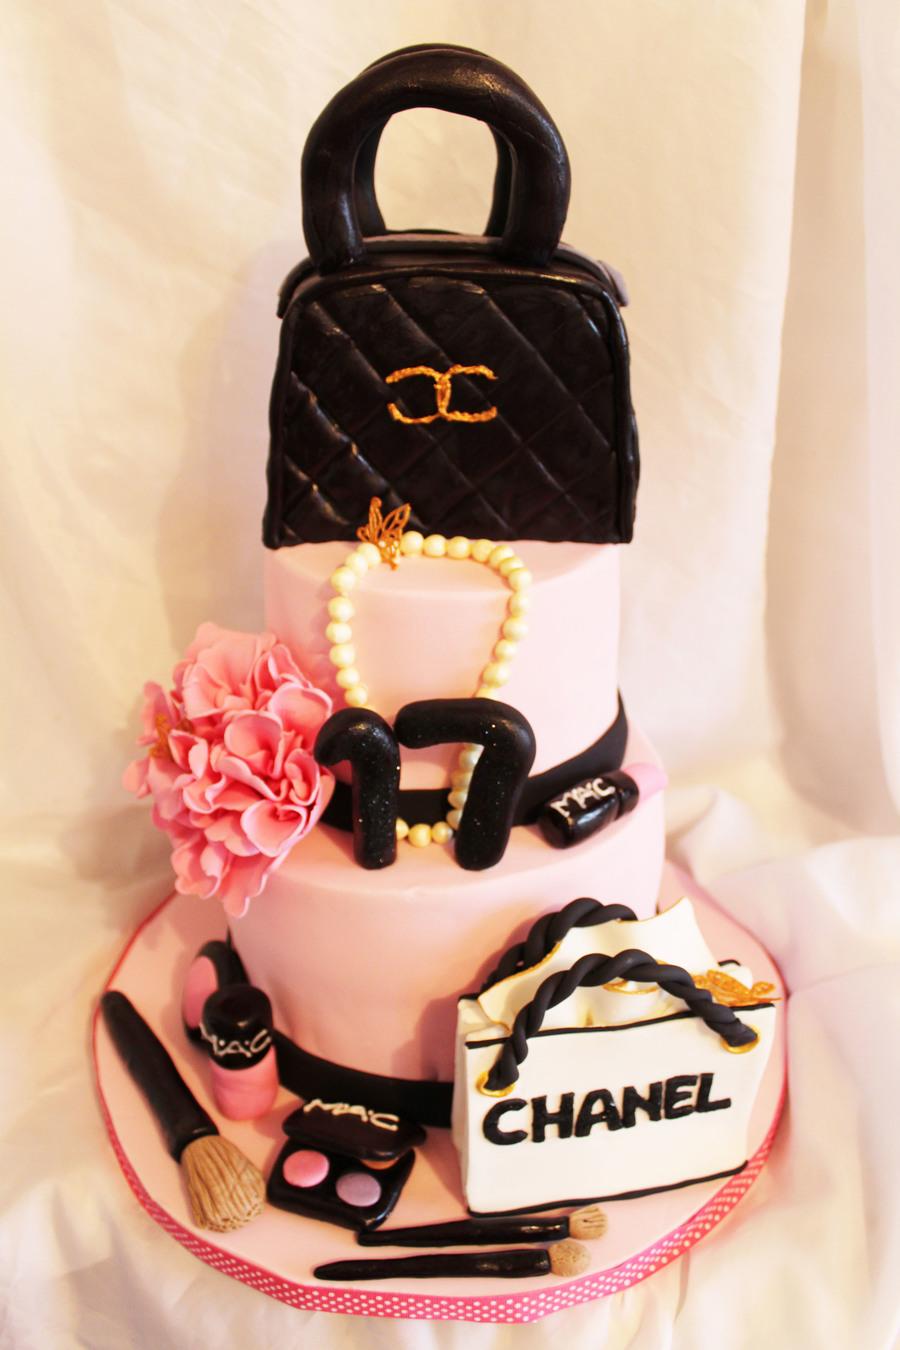 Mac Make Up Girly Cake Cakecentral Com